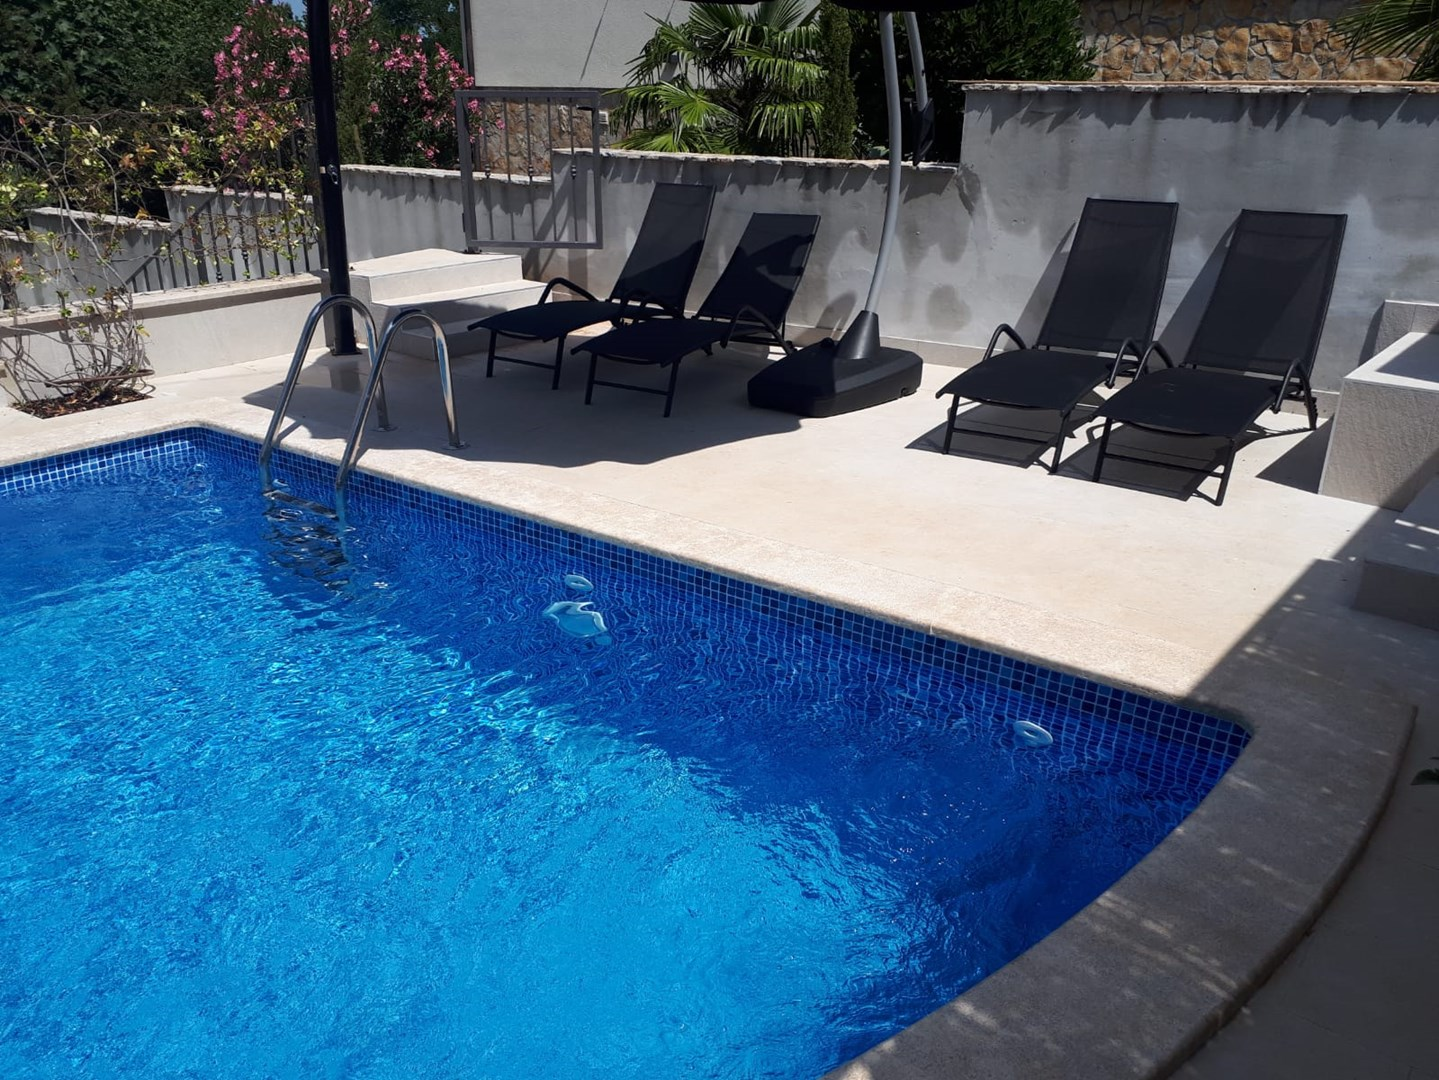 Ferienhaus Villa Albina mit privatem Pool in der Nähe von Aquacolors (2240246), Mugeba, , Istrien, Kroatien, Bild 5